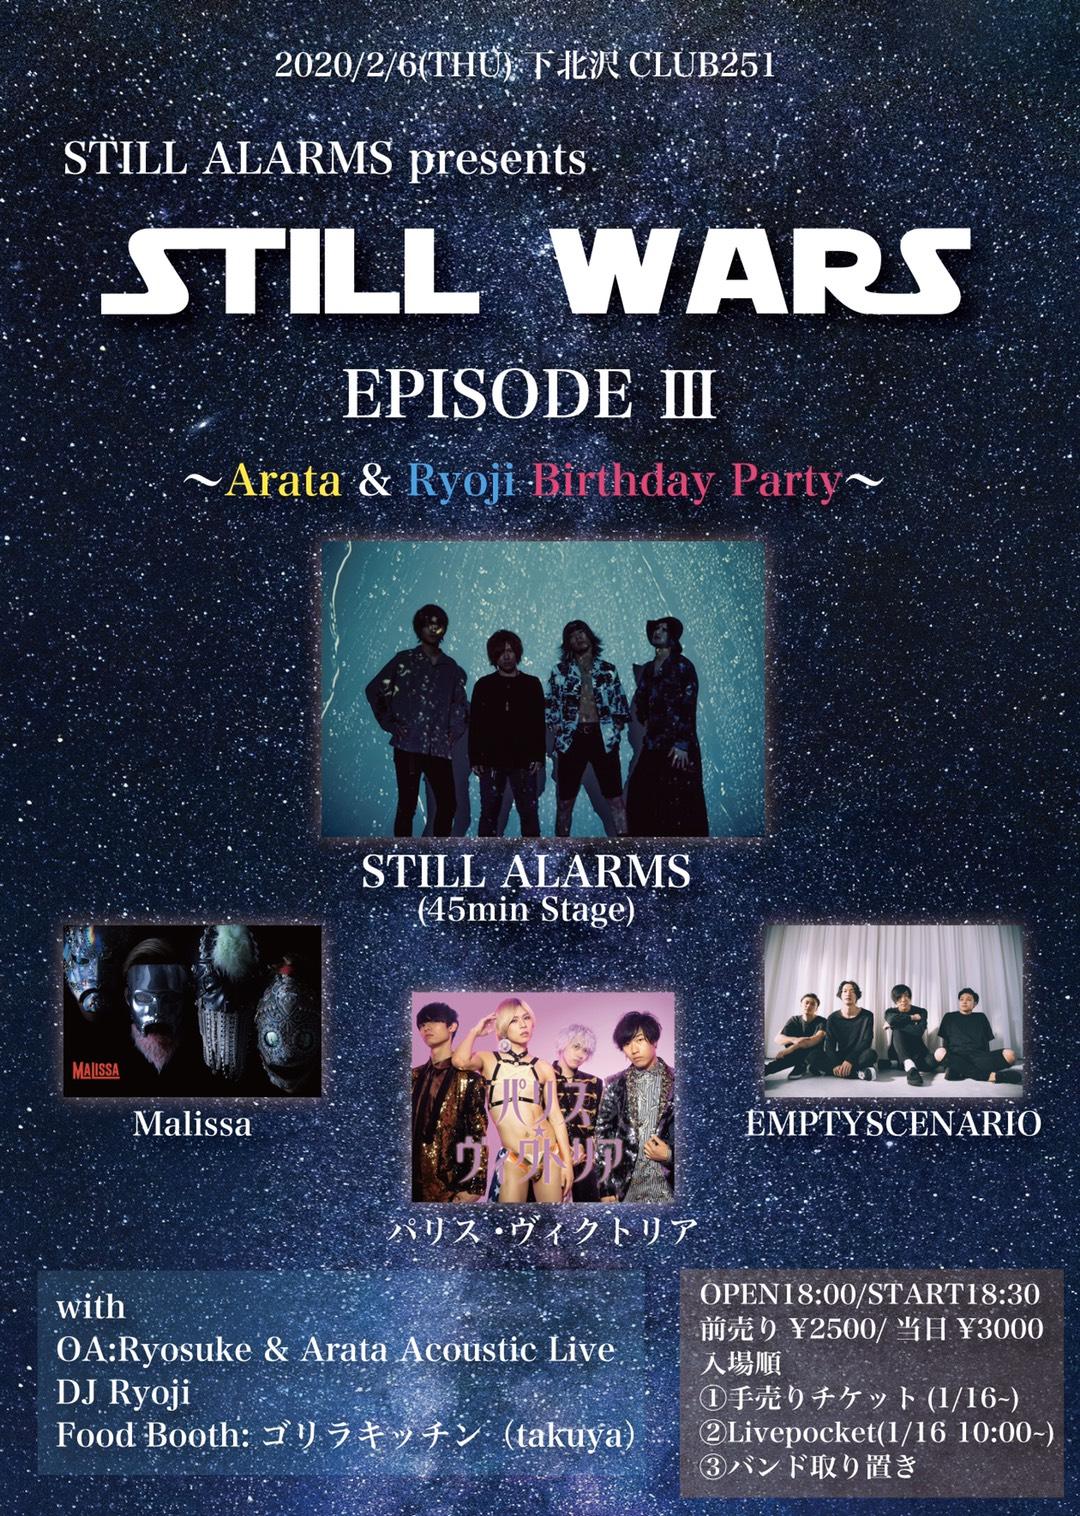 STILL ALARMS presents 「STILL WARS / EPISODE Ⅲ 〜Arata & Ryoji Birthday Party〜」